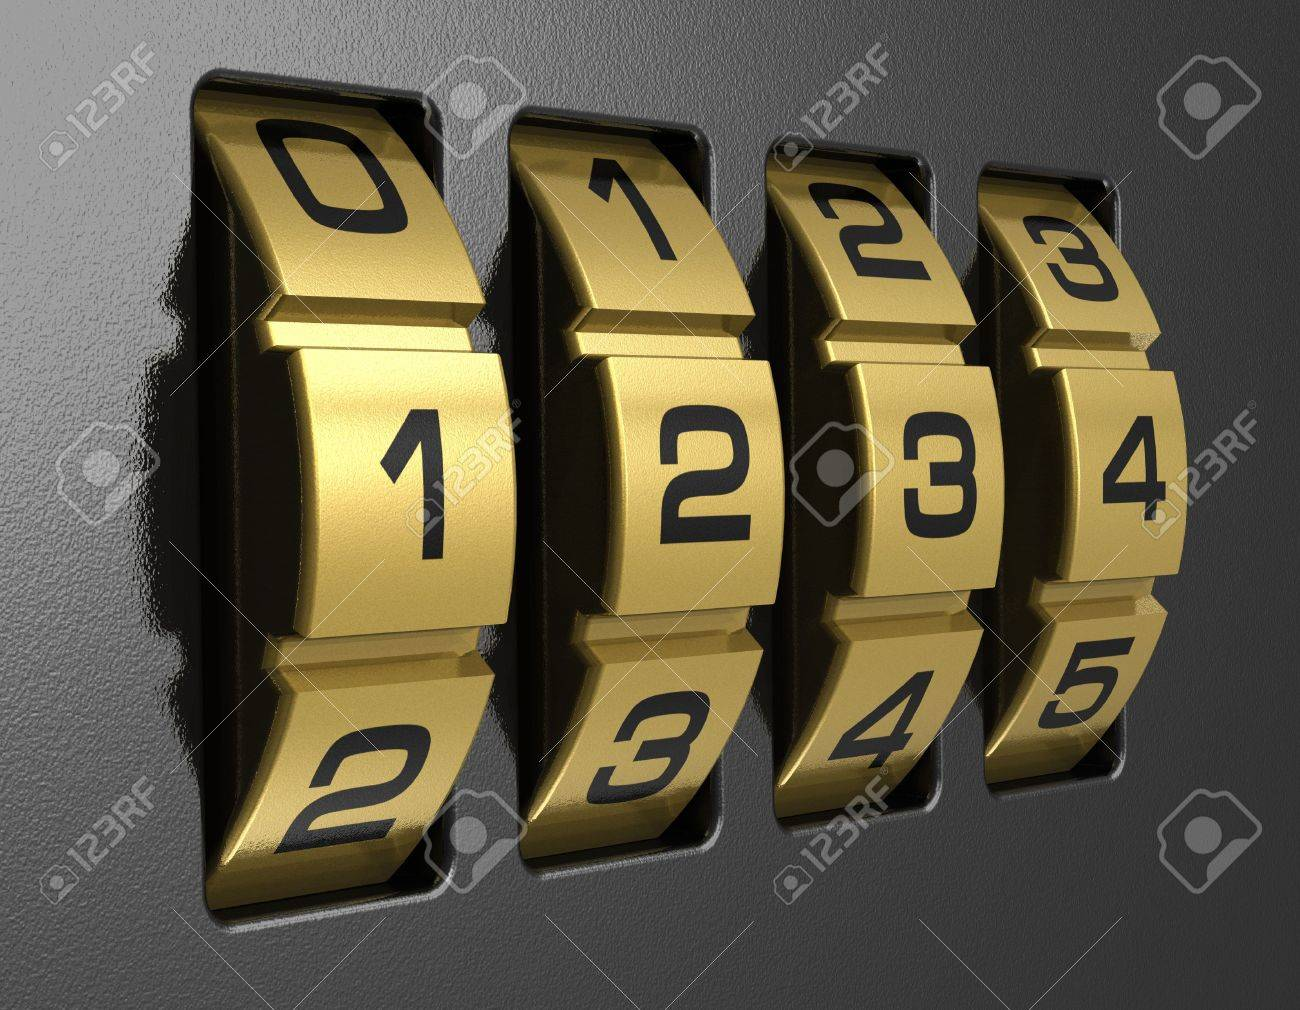 Close view of metal 4-digit combination lock Stock Photo - 9597023